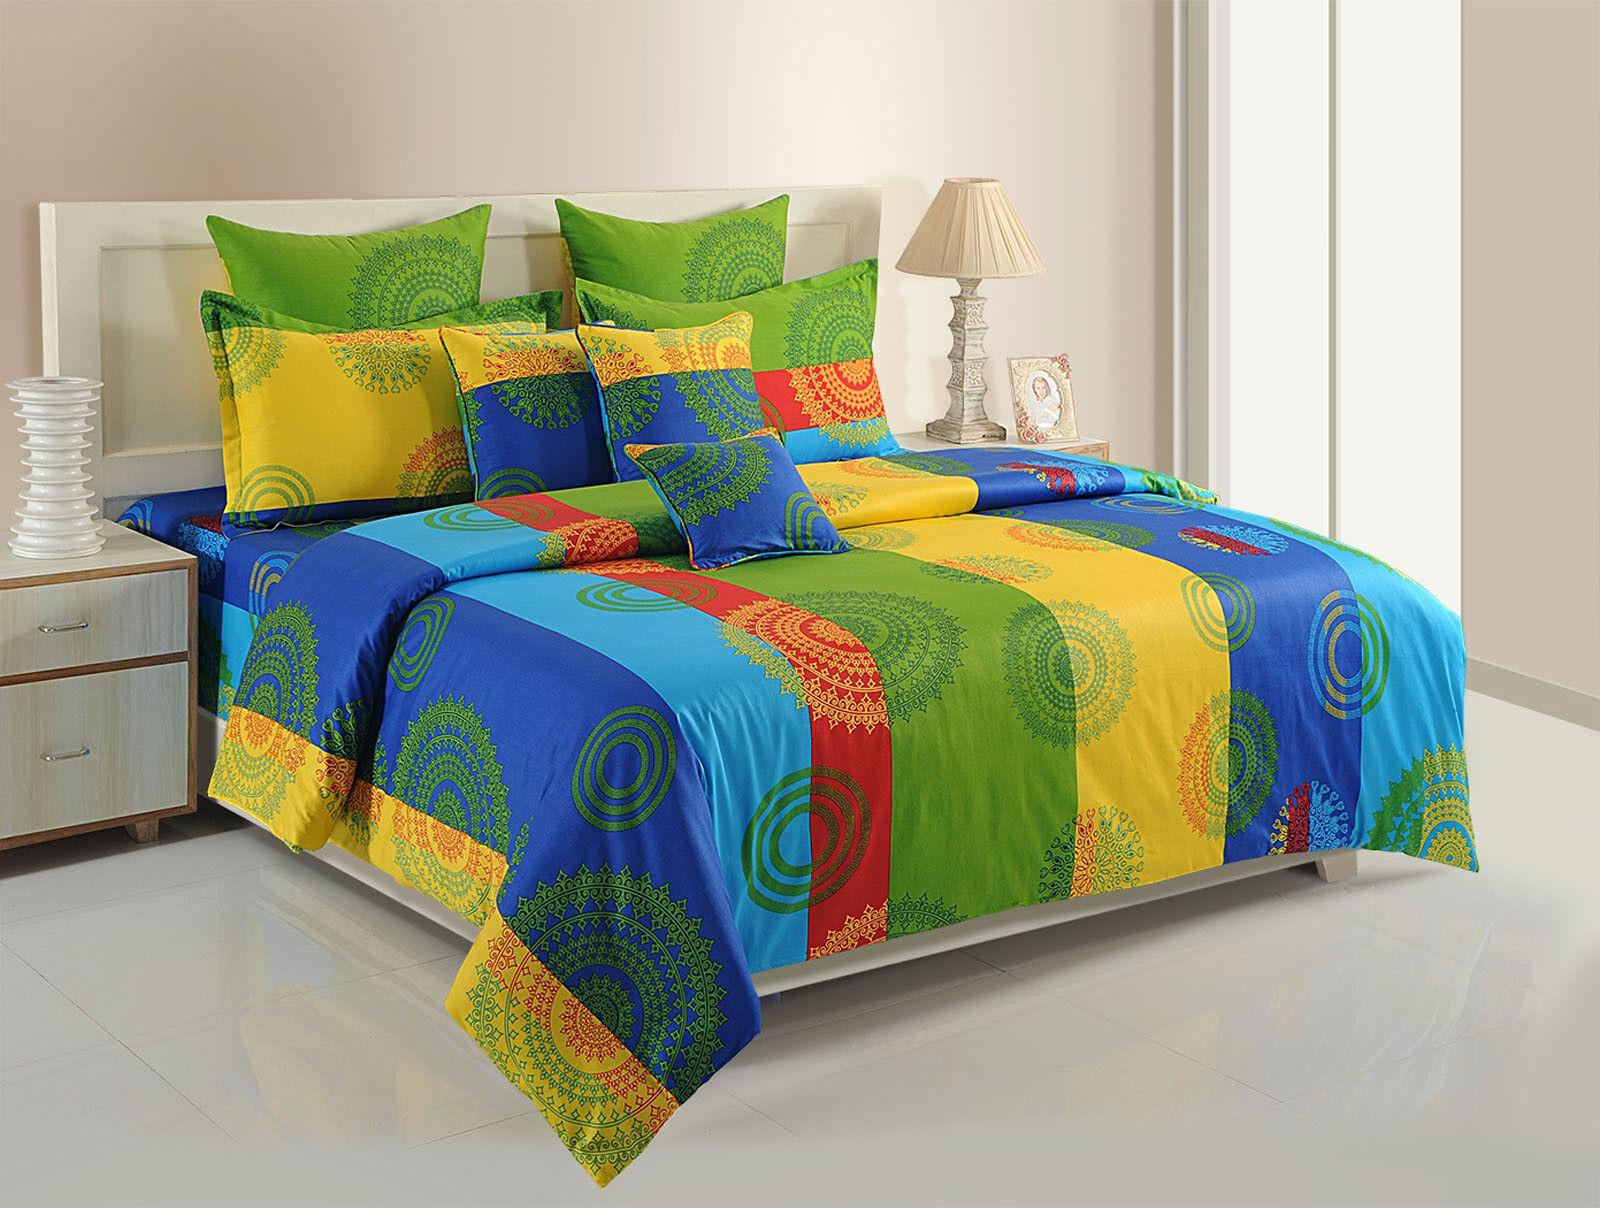 Yuga MultiColoreeeee Mandala Print Cotton Bedding Set Flatsheets 210 TC Bed-sheet